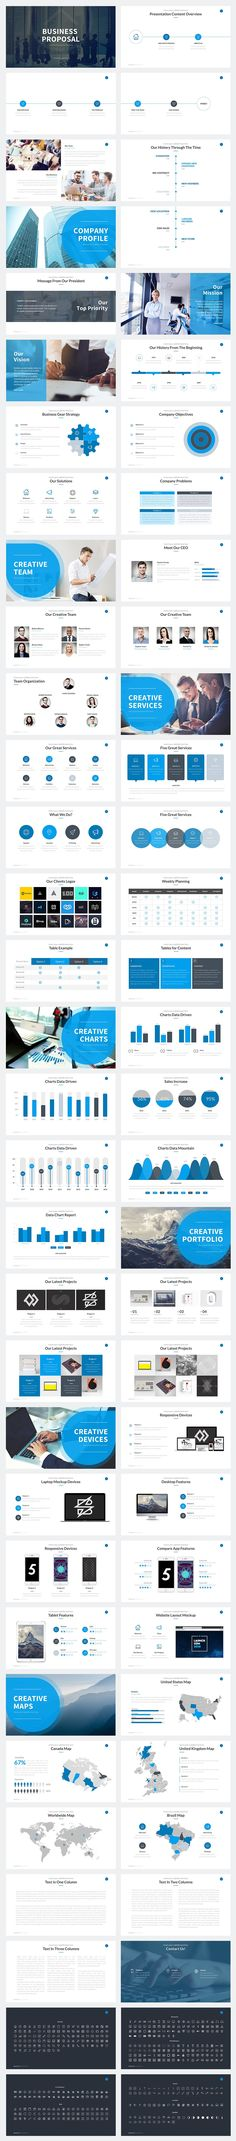 Novator Powerpoint Presentation Template Professional Powerpoint